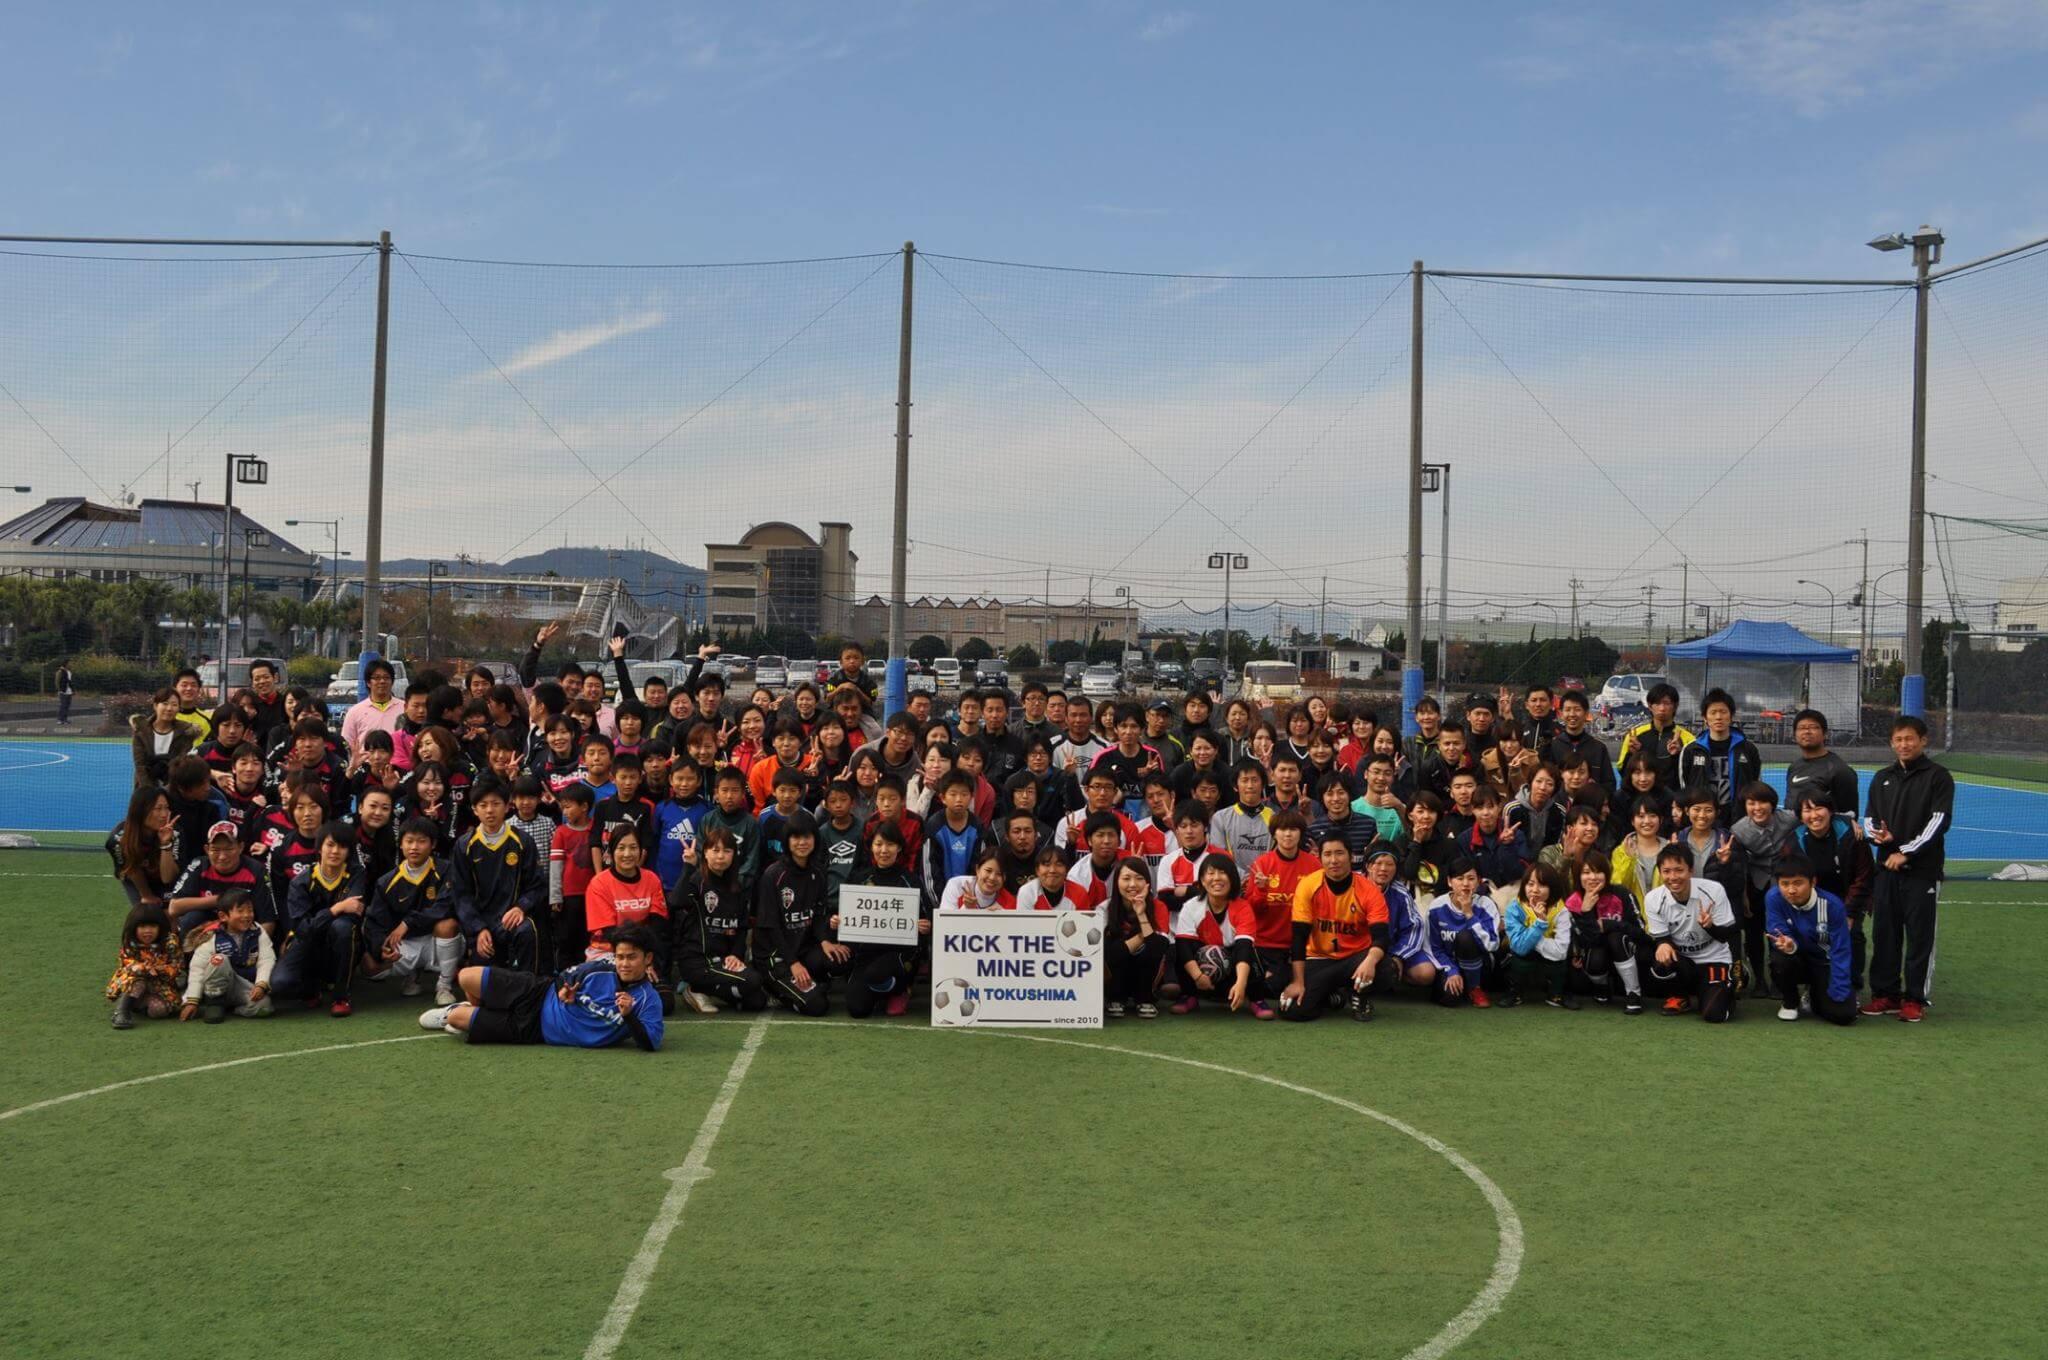 横浜市立大学、宇都宮大学、大阪、徳島にてKICK THE MINE CUP開催